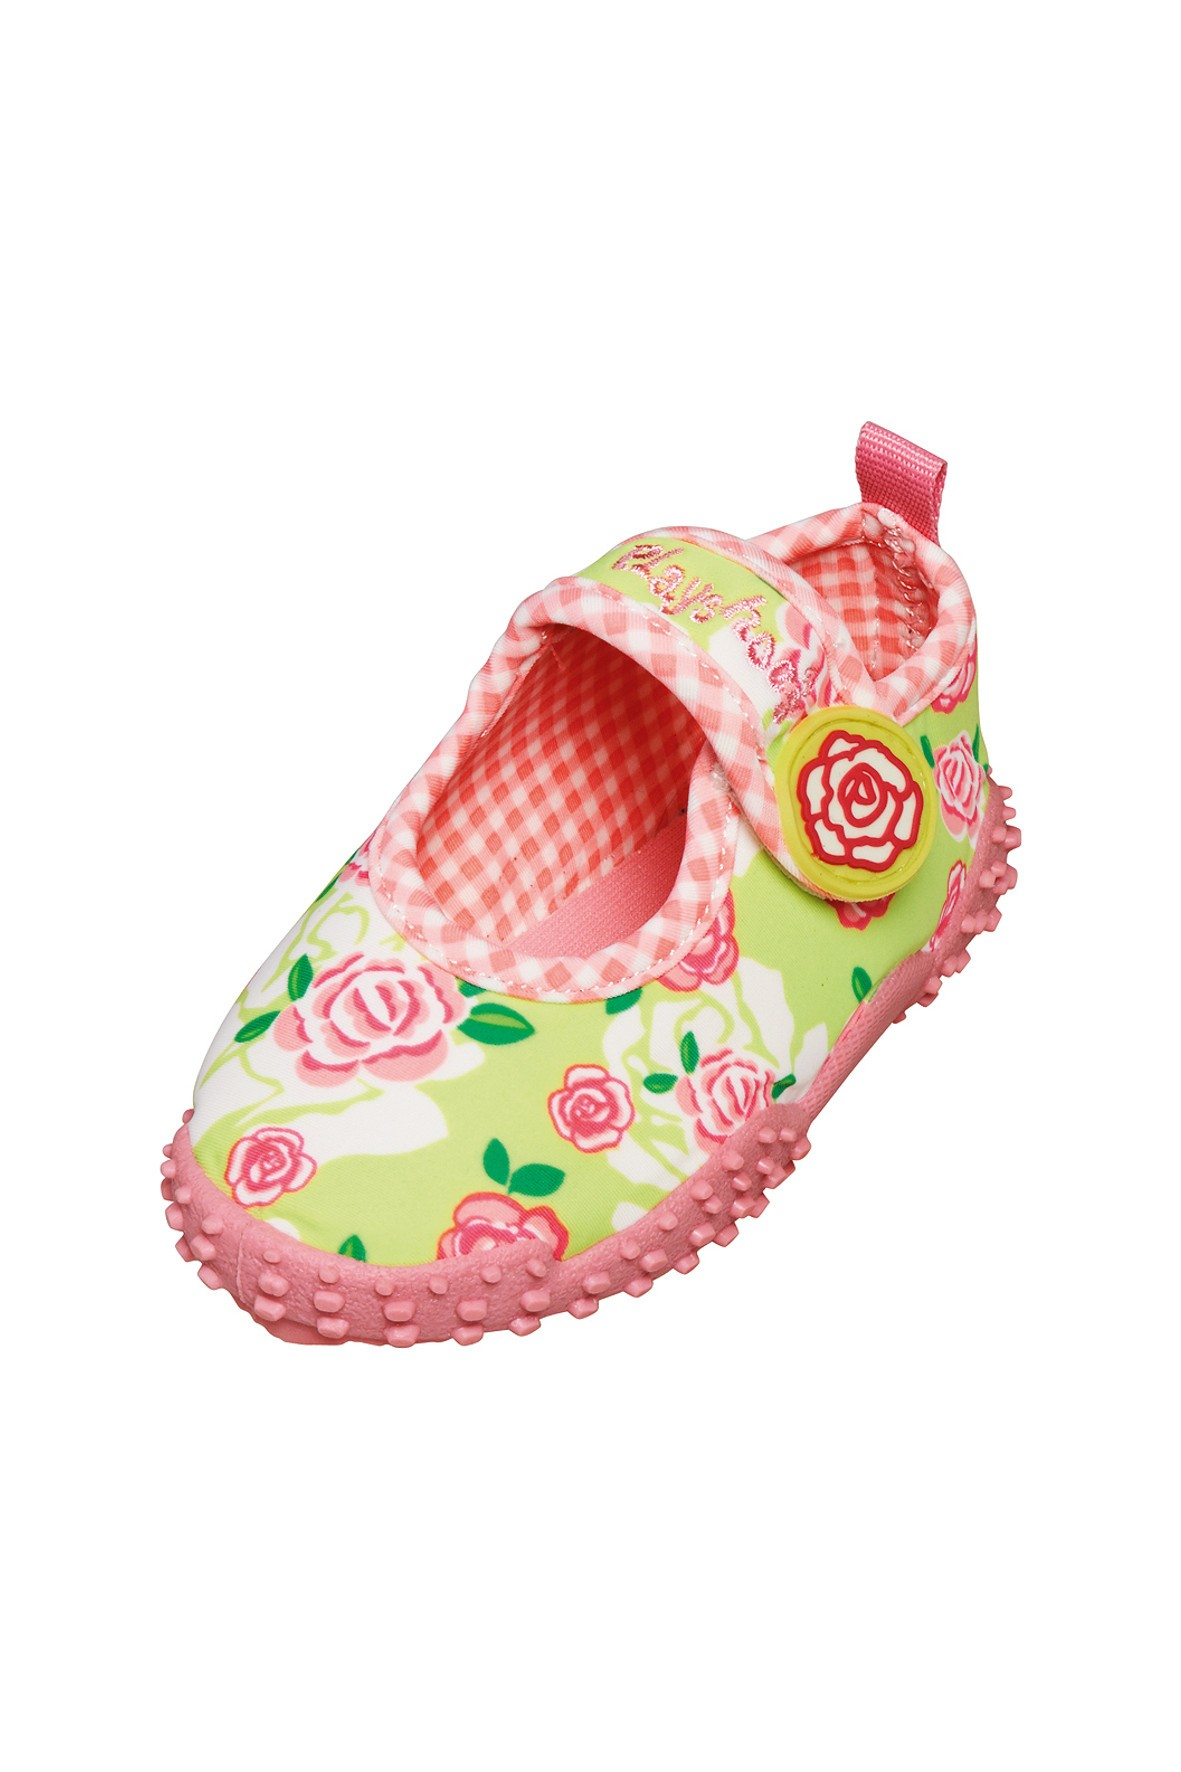 Buty kąpielowe z filtrem UV